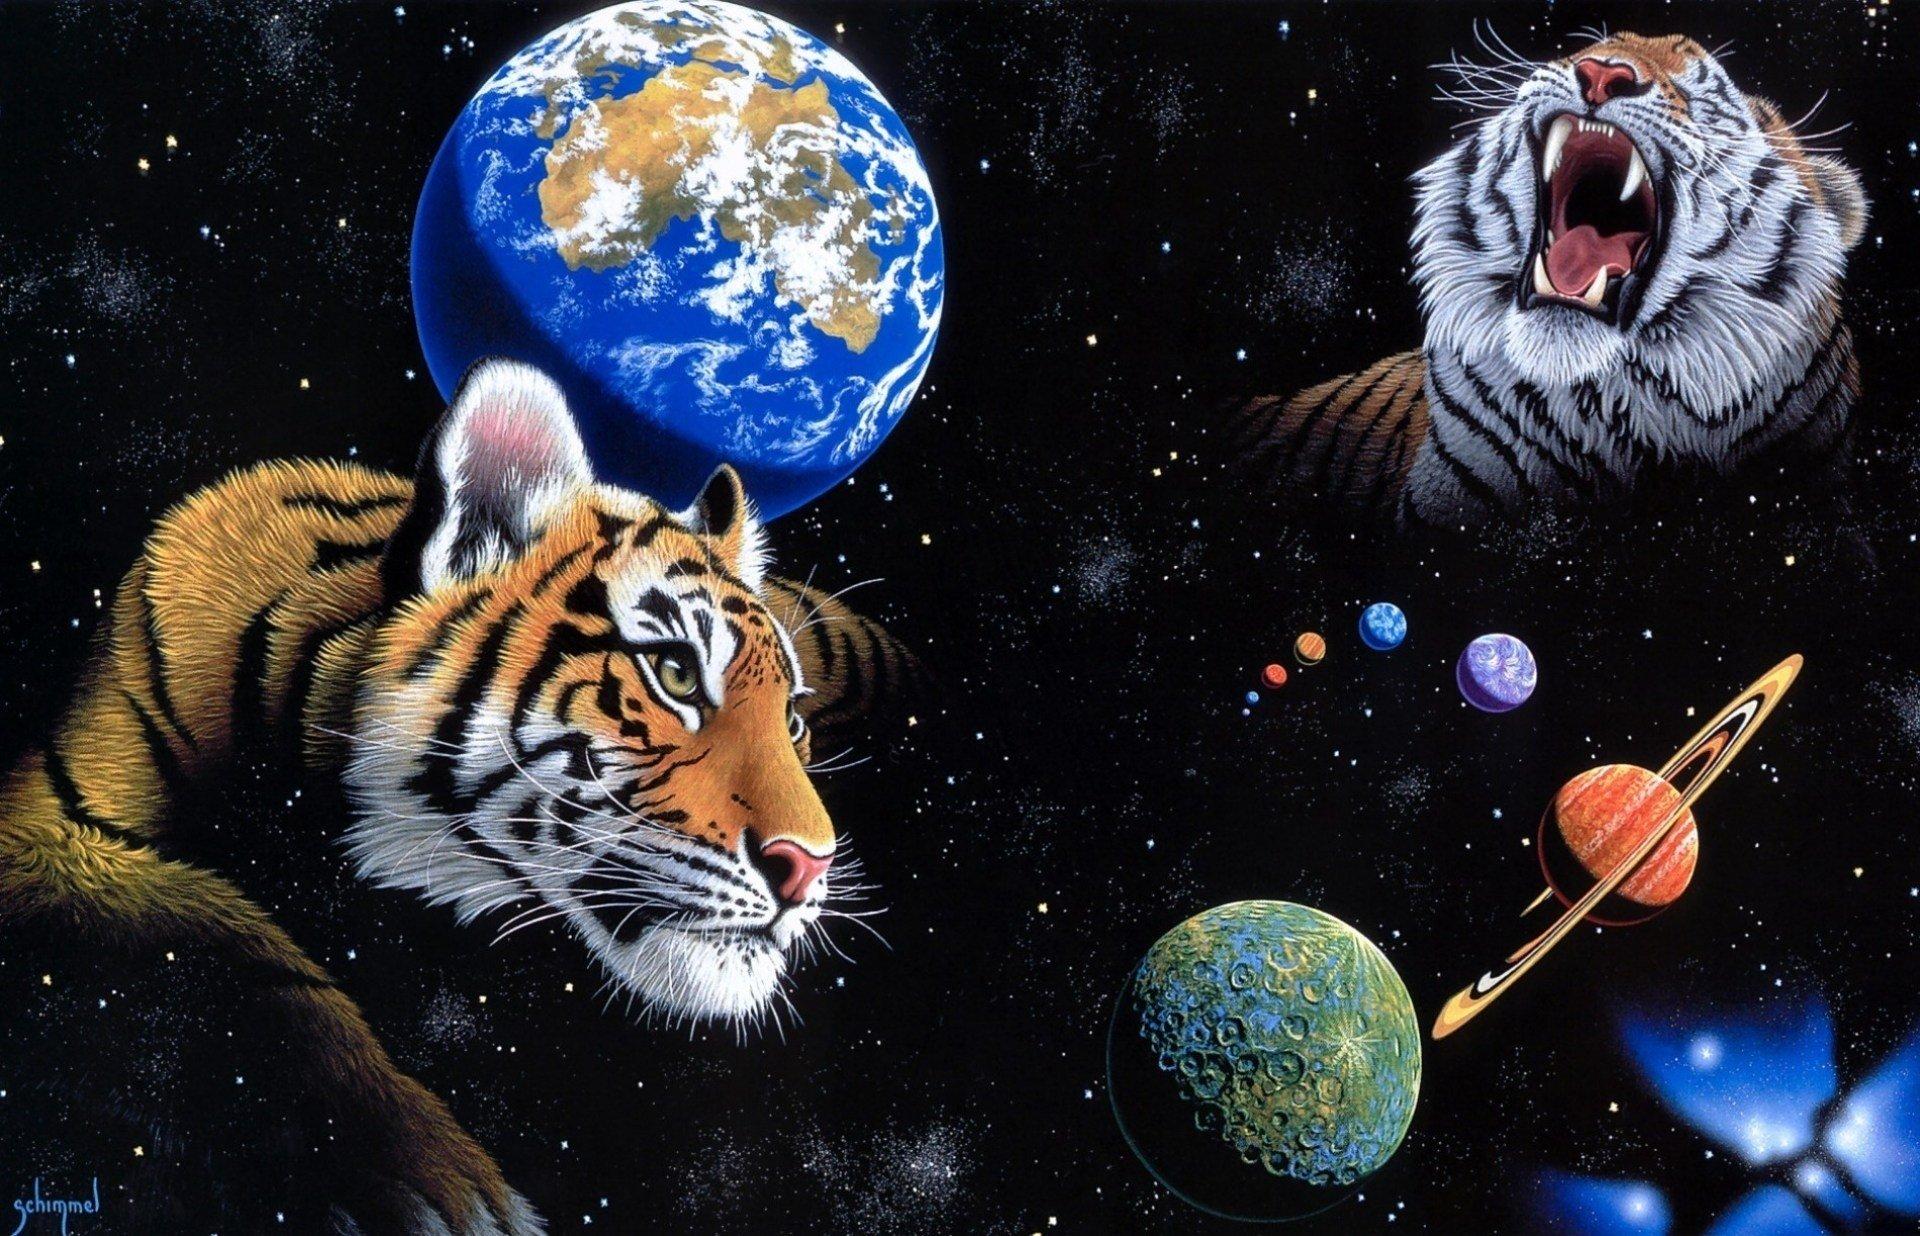 Tiger HD Wallpaper | Background Image | 1920x1236 | ID ...